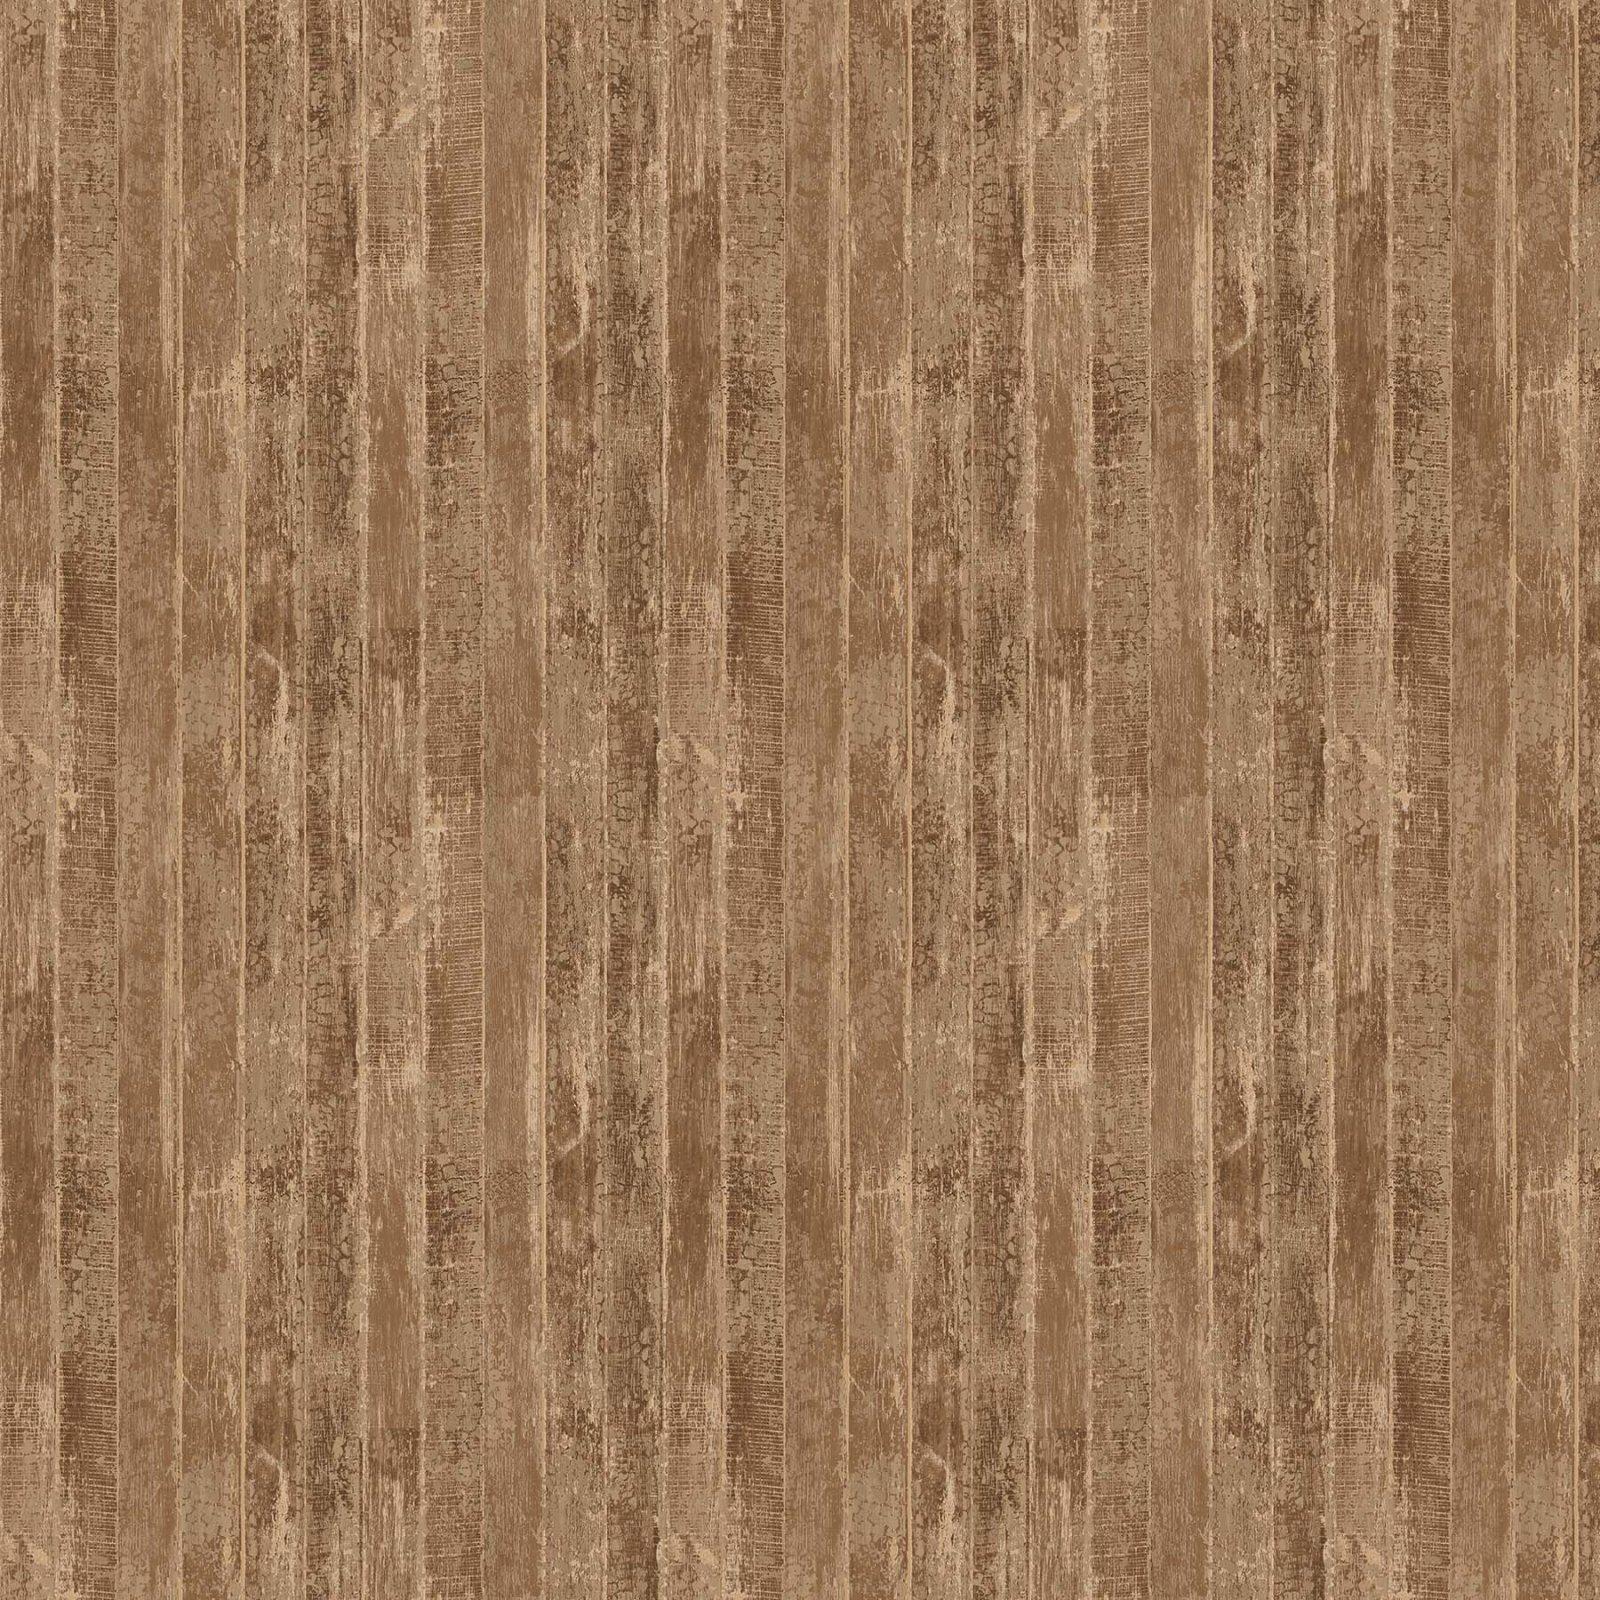 Northcott - Alpine Winter - Wood Grain Bron 24338-34